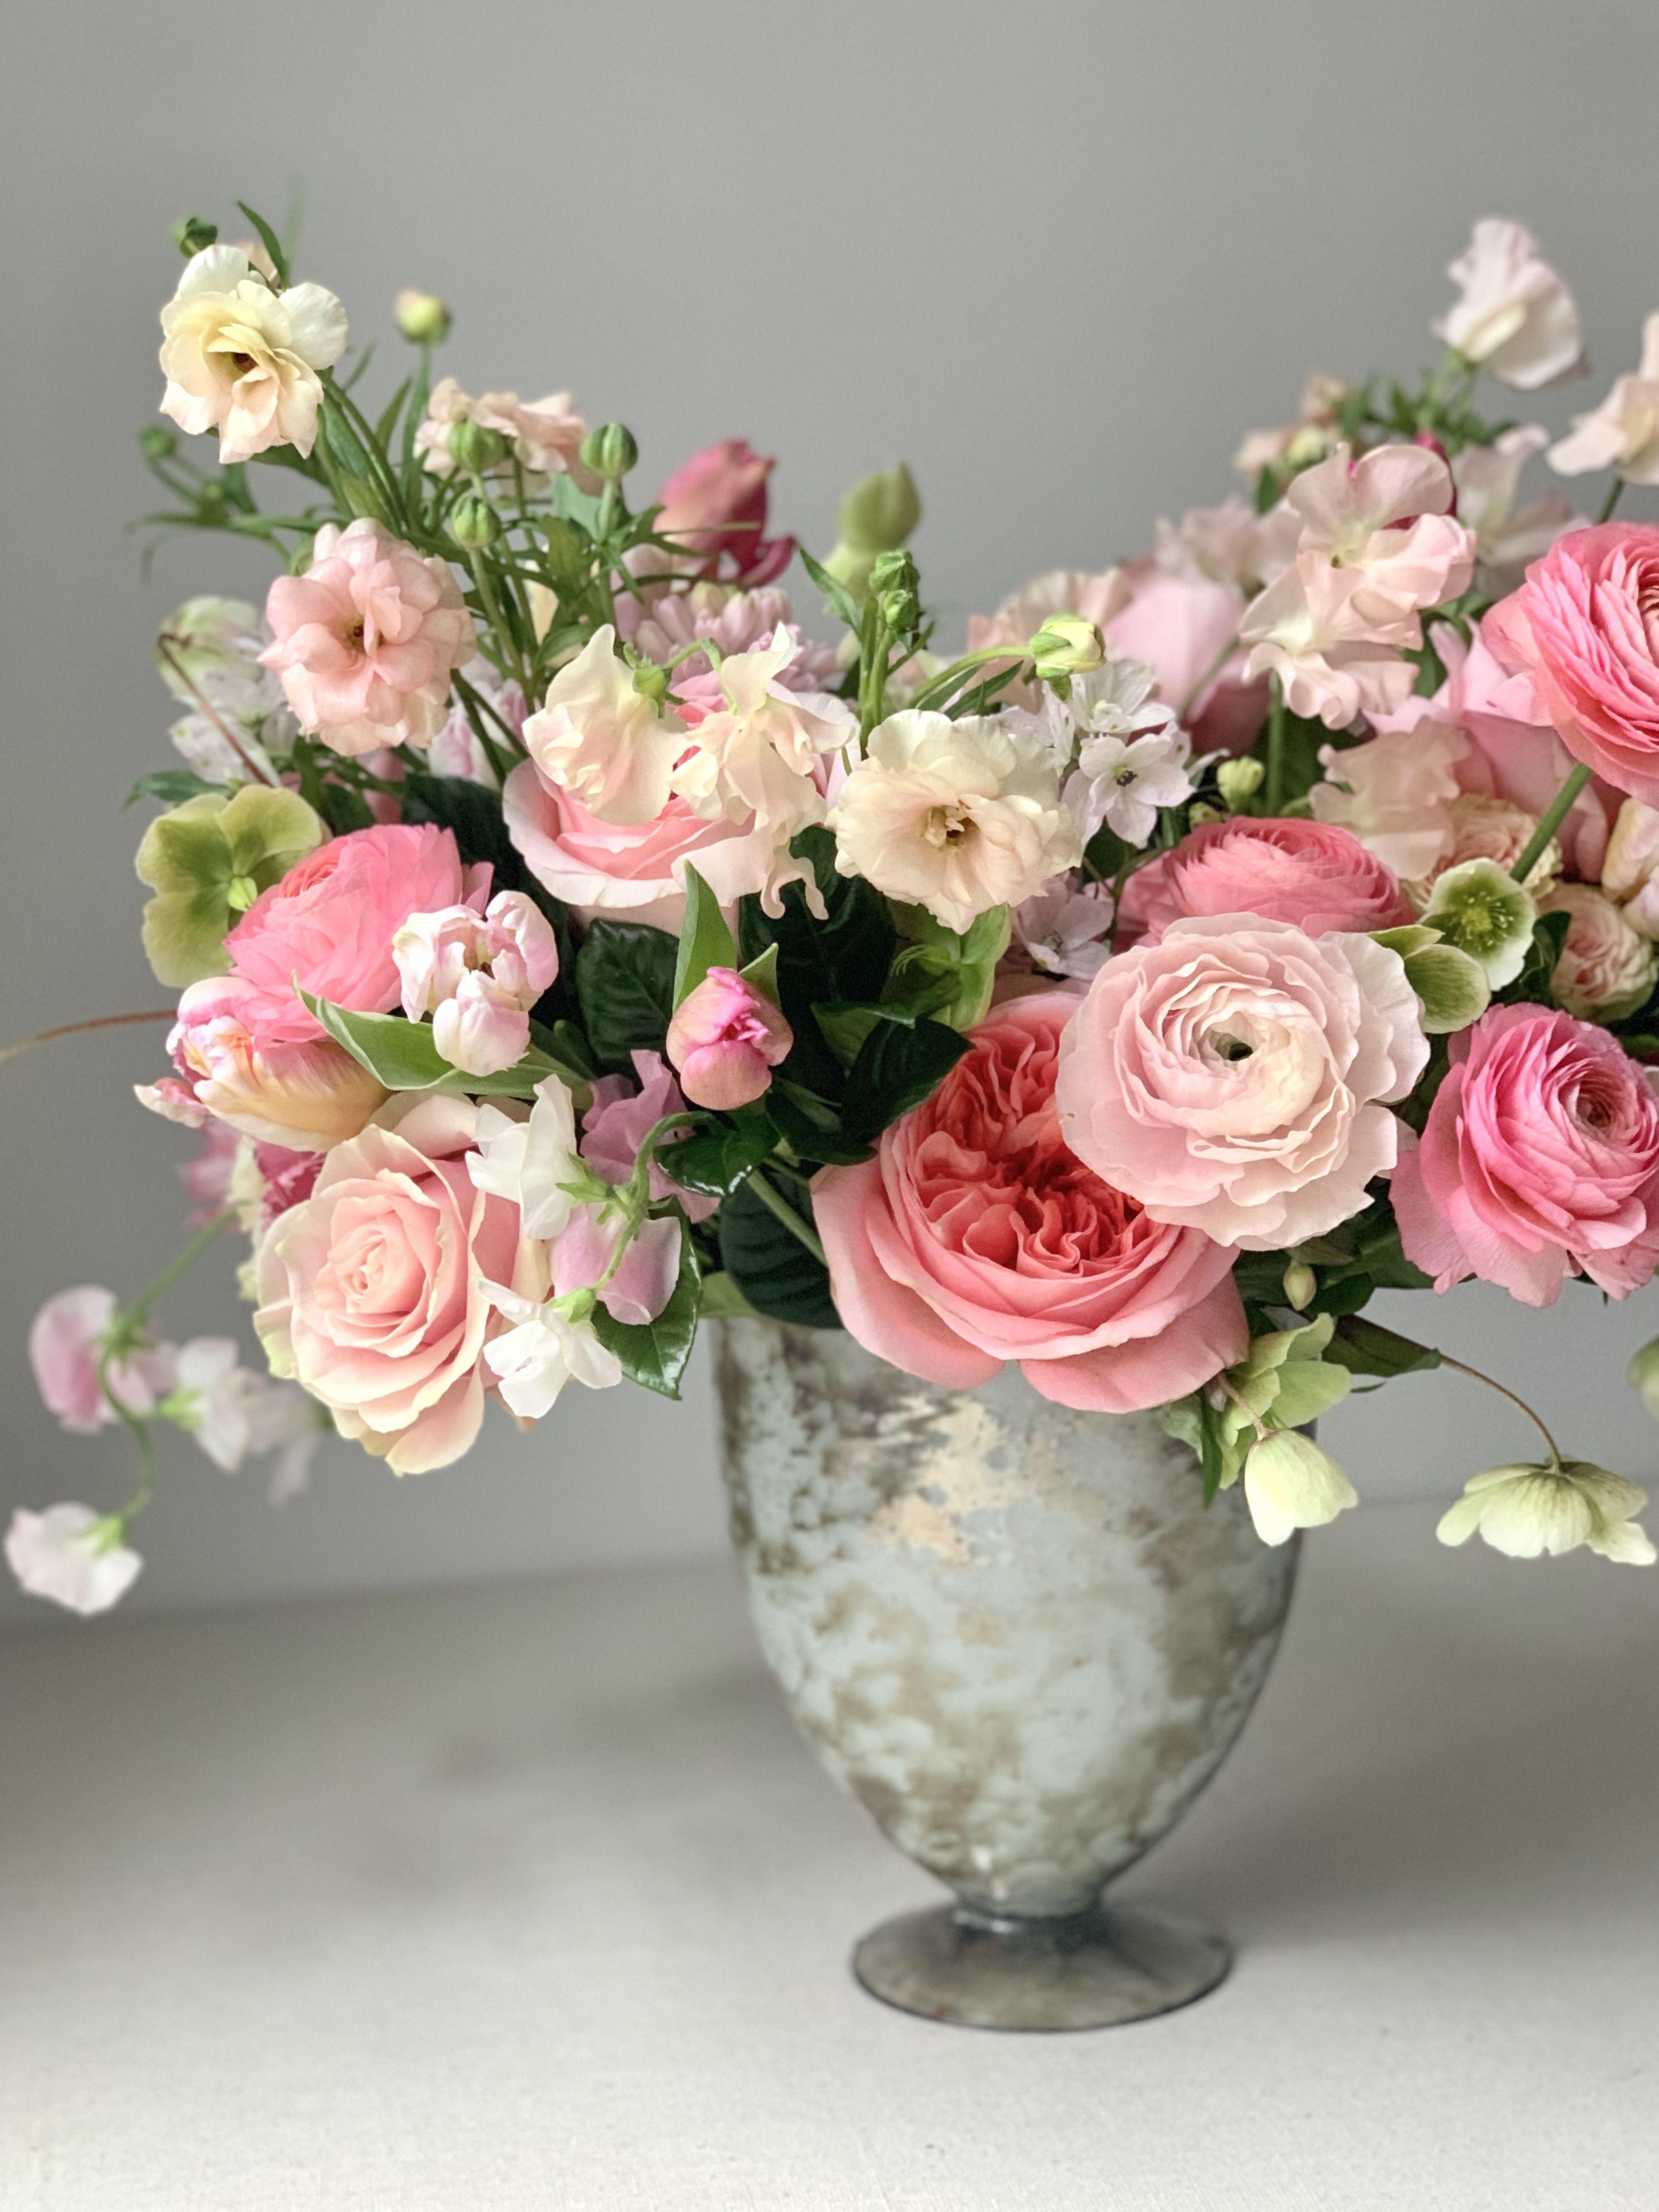 Pretty In Pink In 2020 Pink Flower Arrangements Beautiful Flower Arrangements Order Flowers